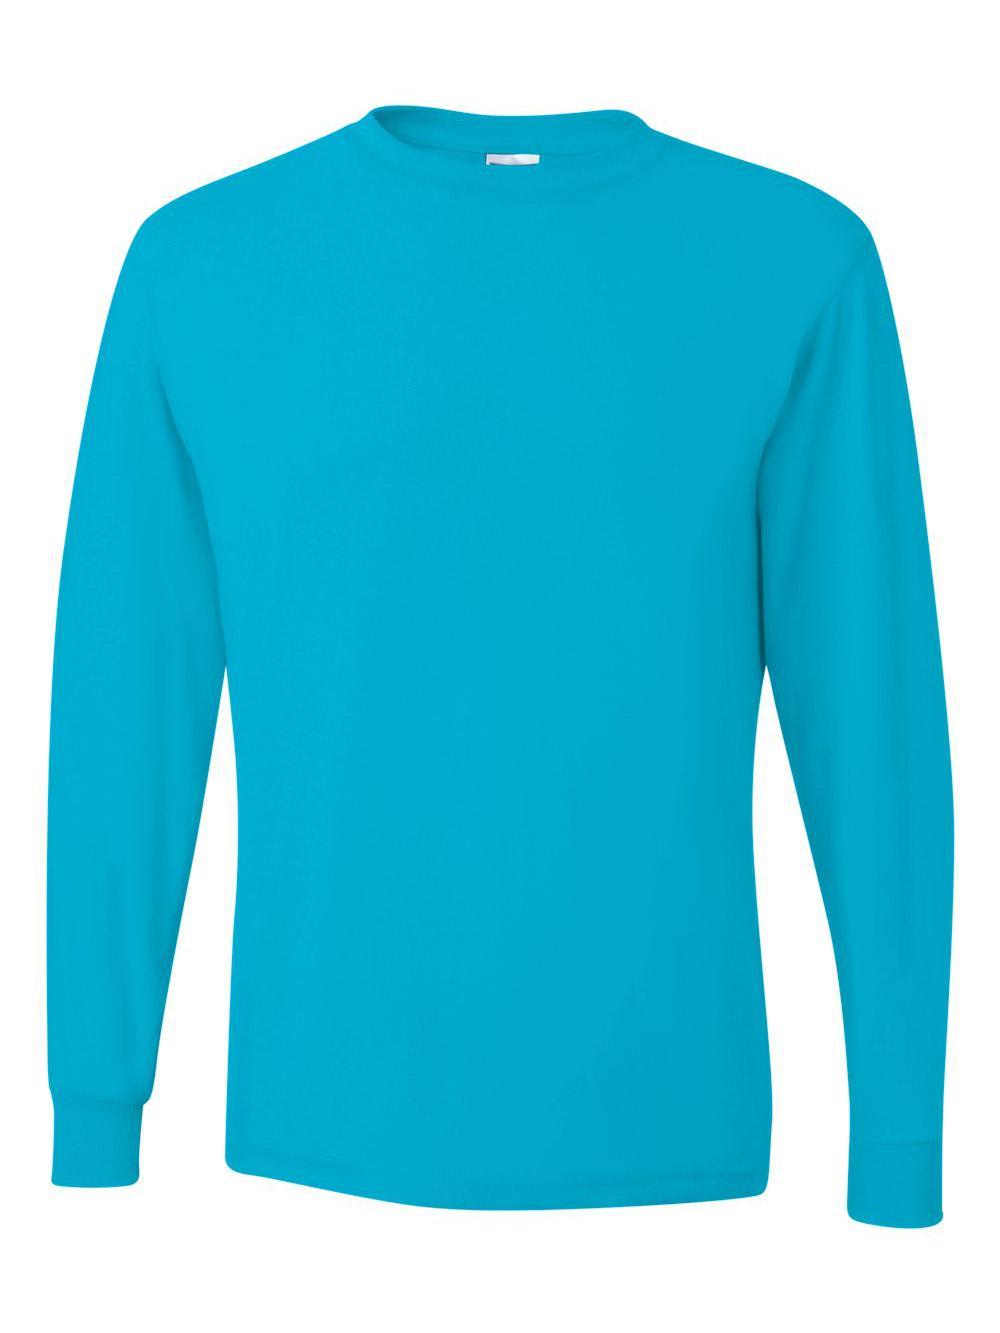 Jerzees-Dri-Power-Long-Sleeve-50-50-T-Shirt-29LSR thumbnail 18